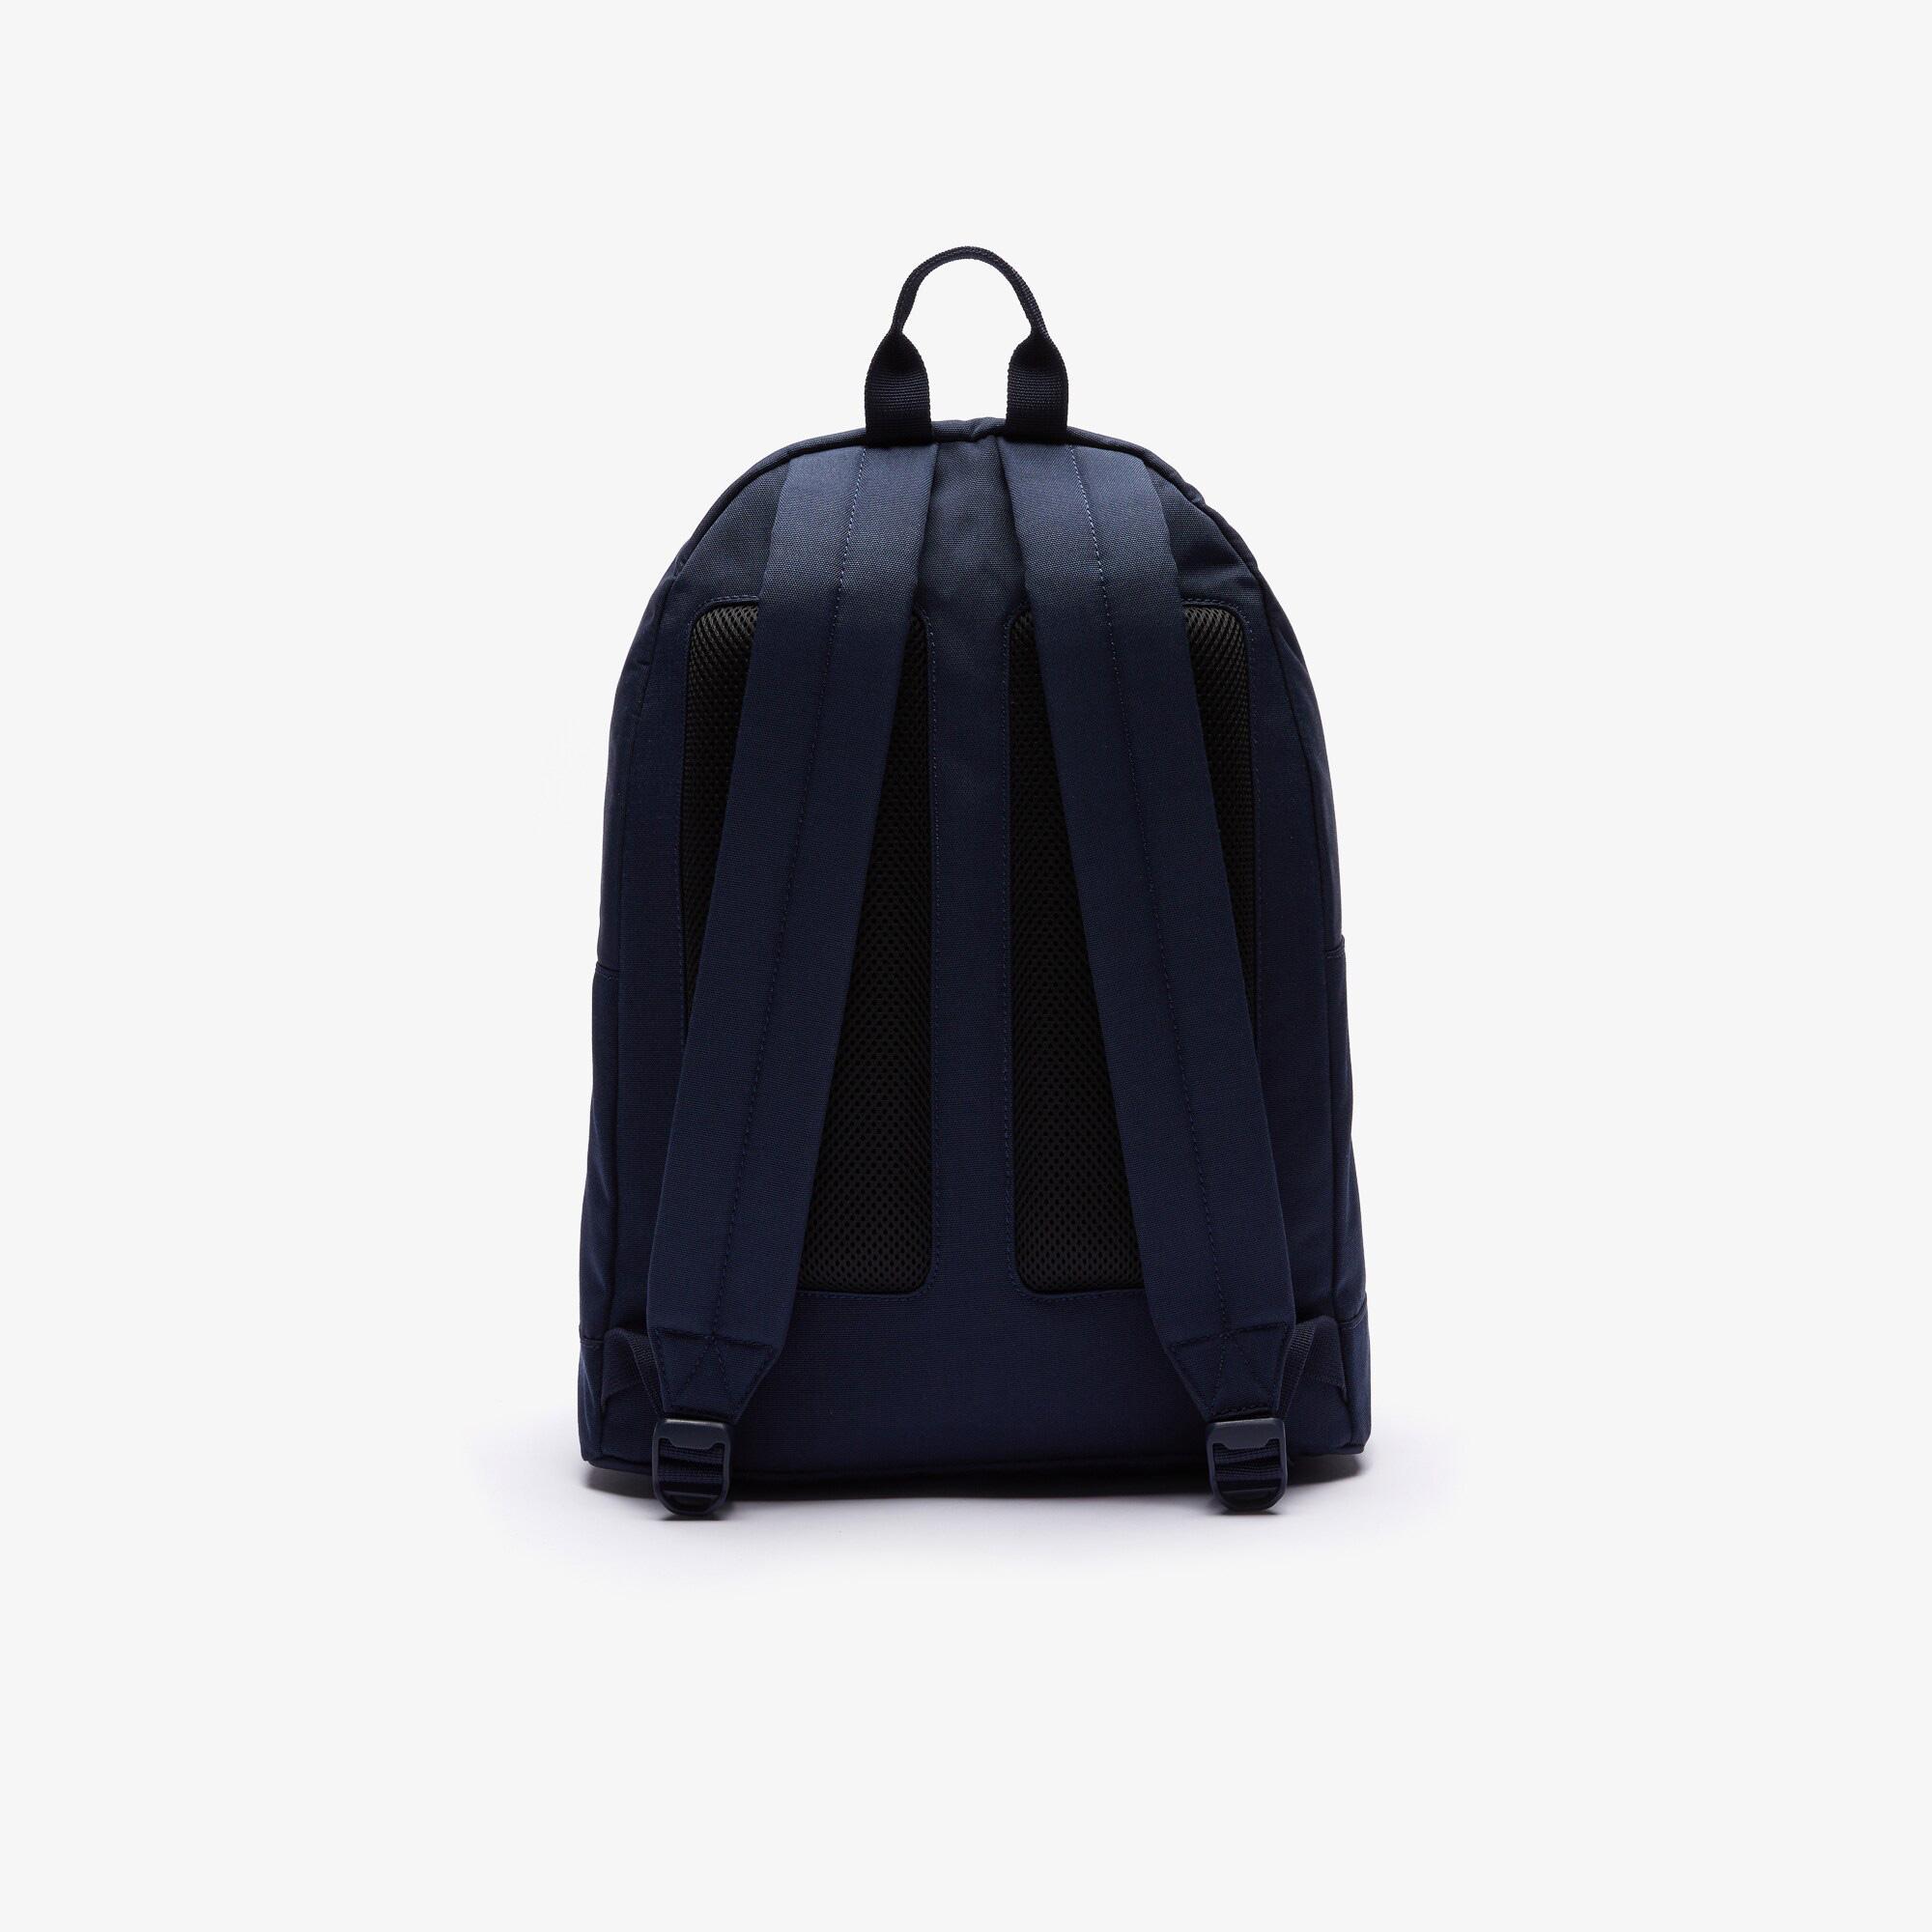 Lacoste Men's Neocroc L27 Lettered Canvas Backpack